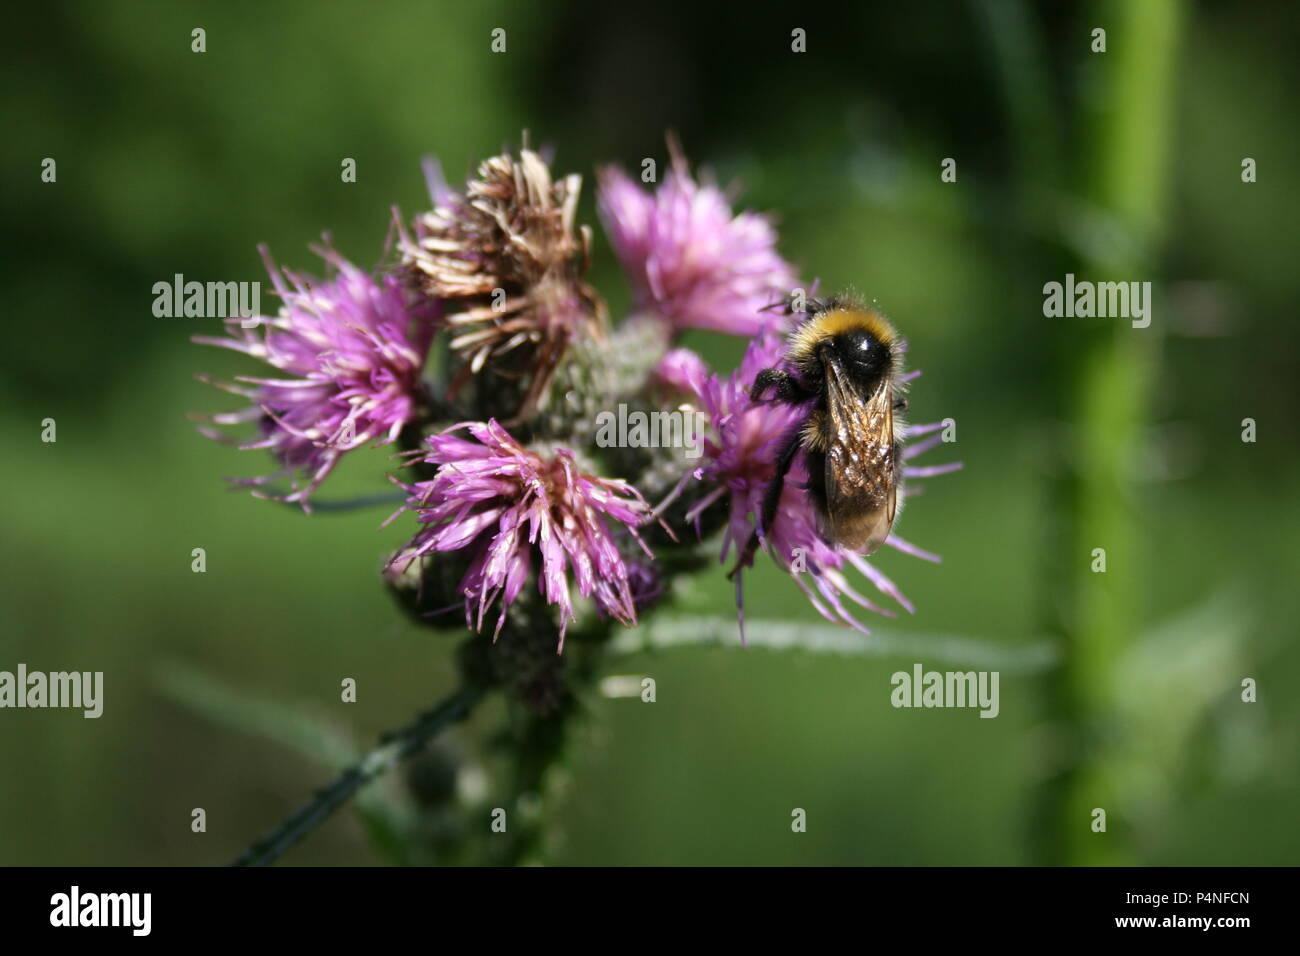 Hummel auf Distel - Stock Image